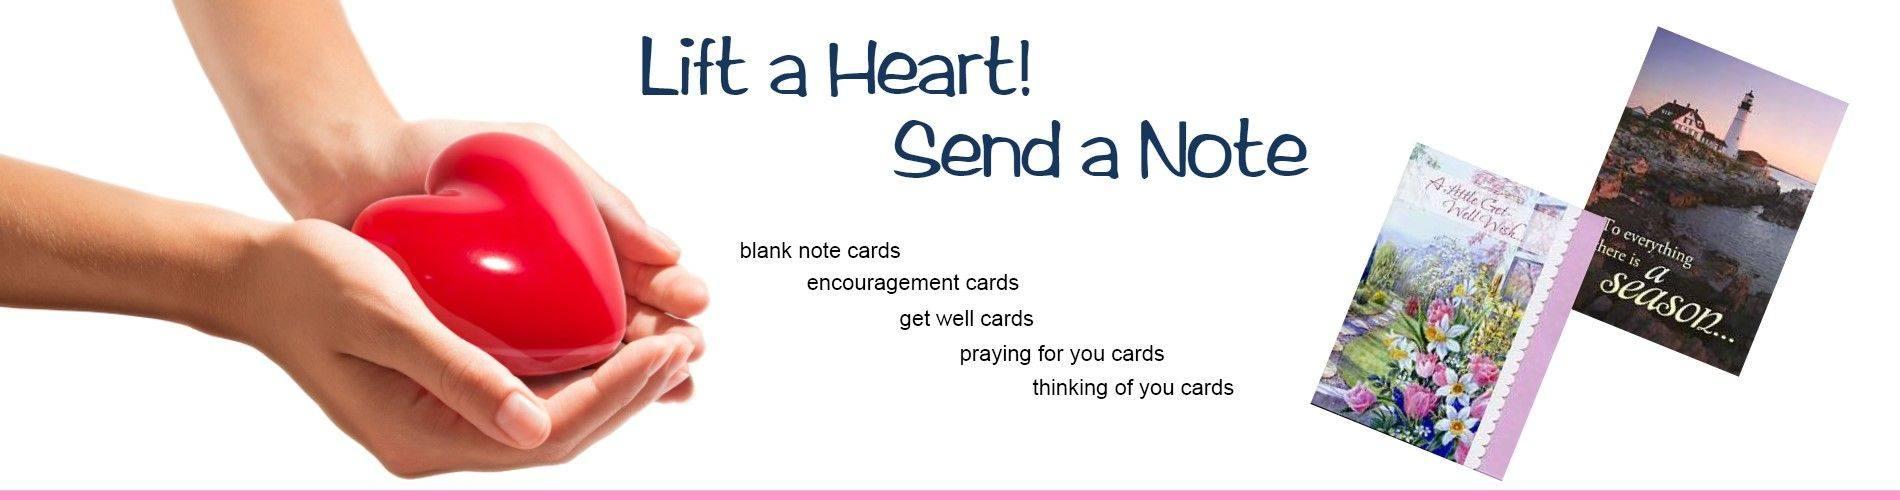 Inspirational greetng cards